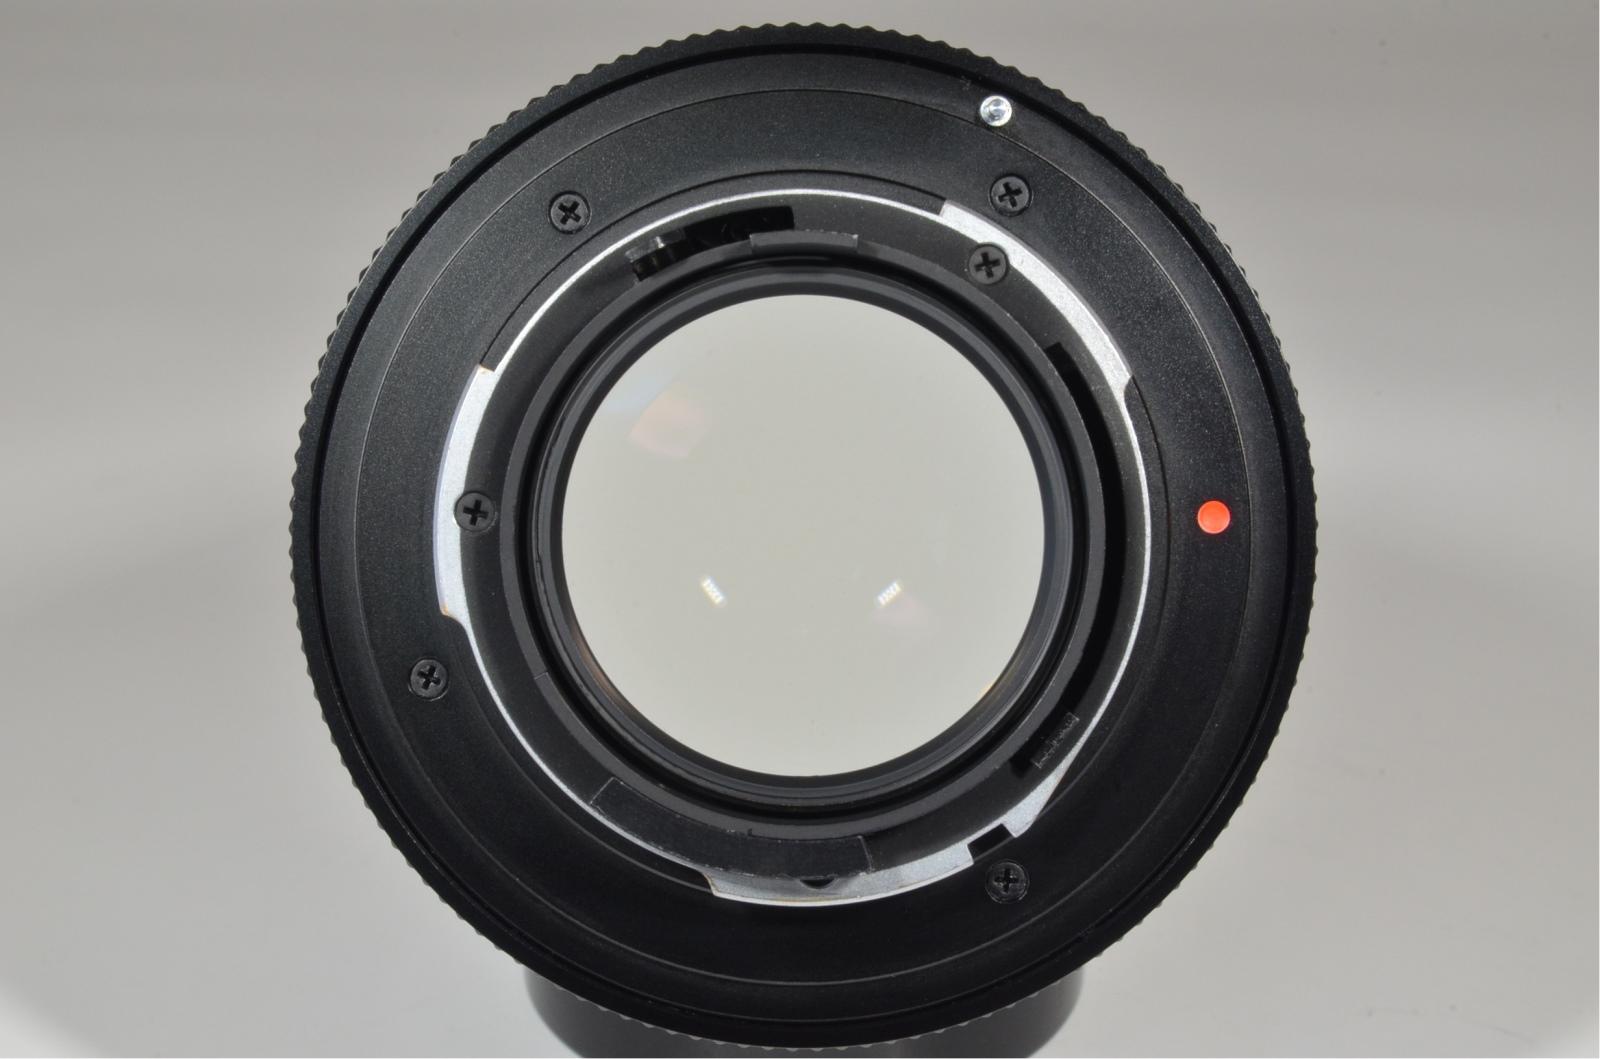 contax carl zeiss planar t* 85mm f1.4 mmg